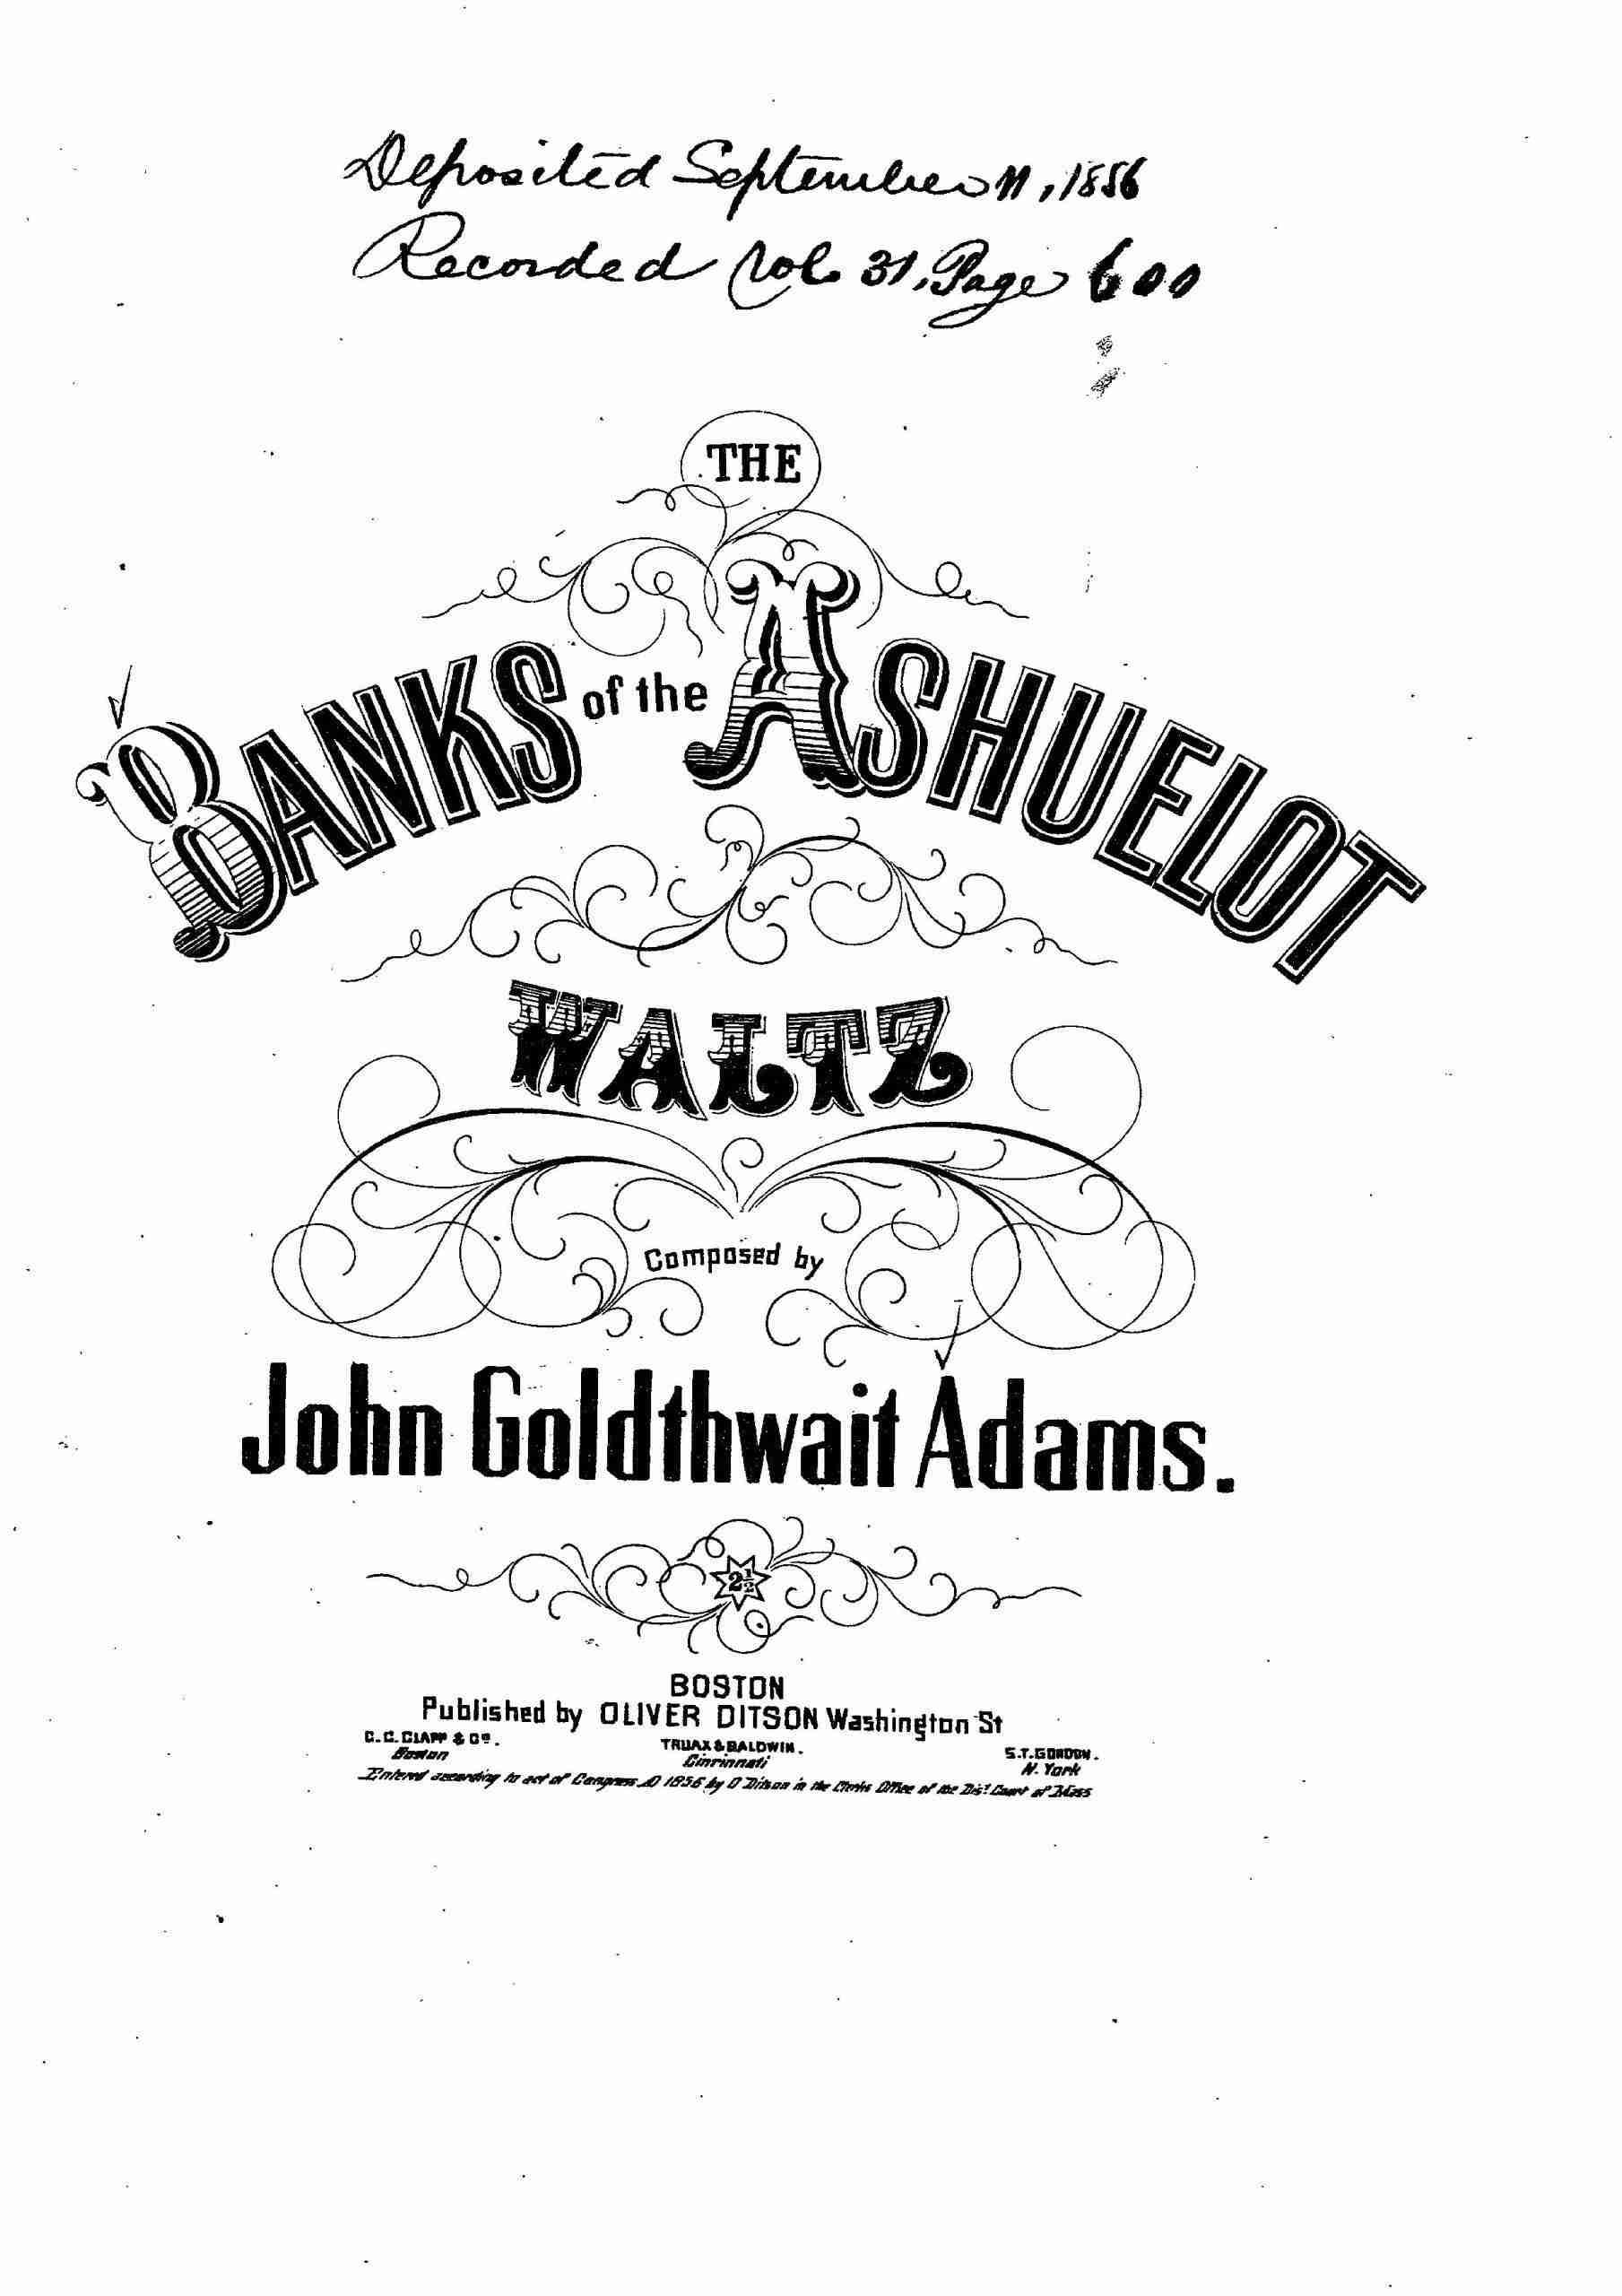 Adams, John Goldthwait - The Banks of the Ashuelot